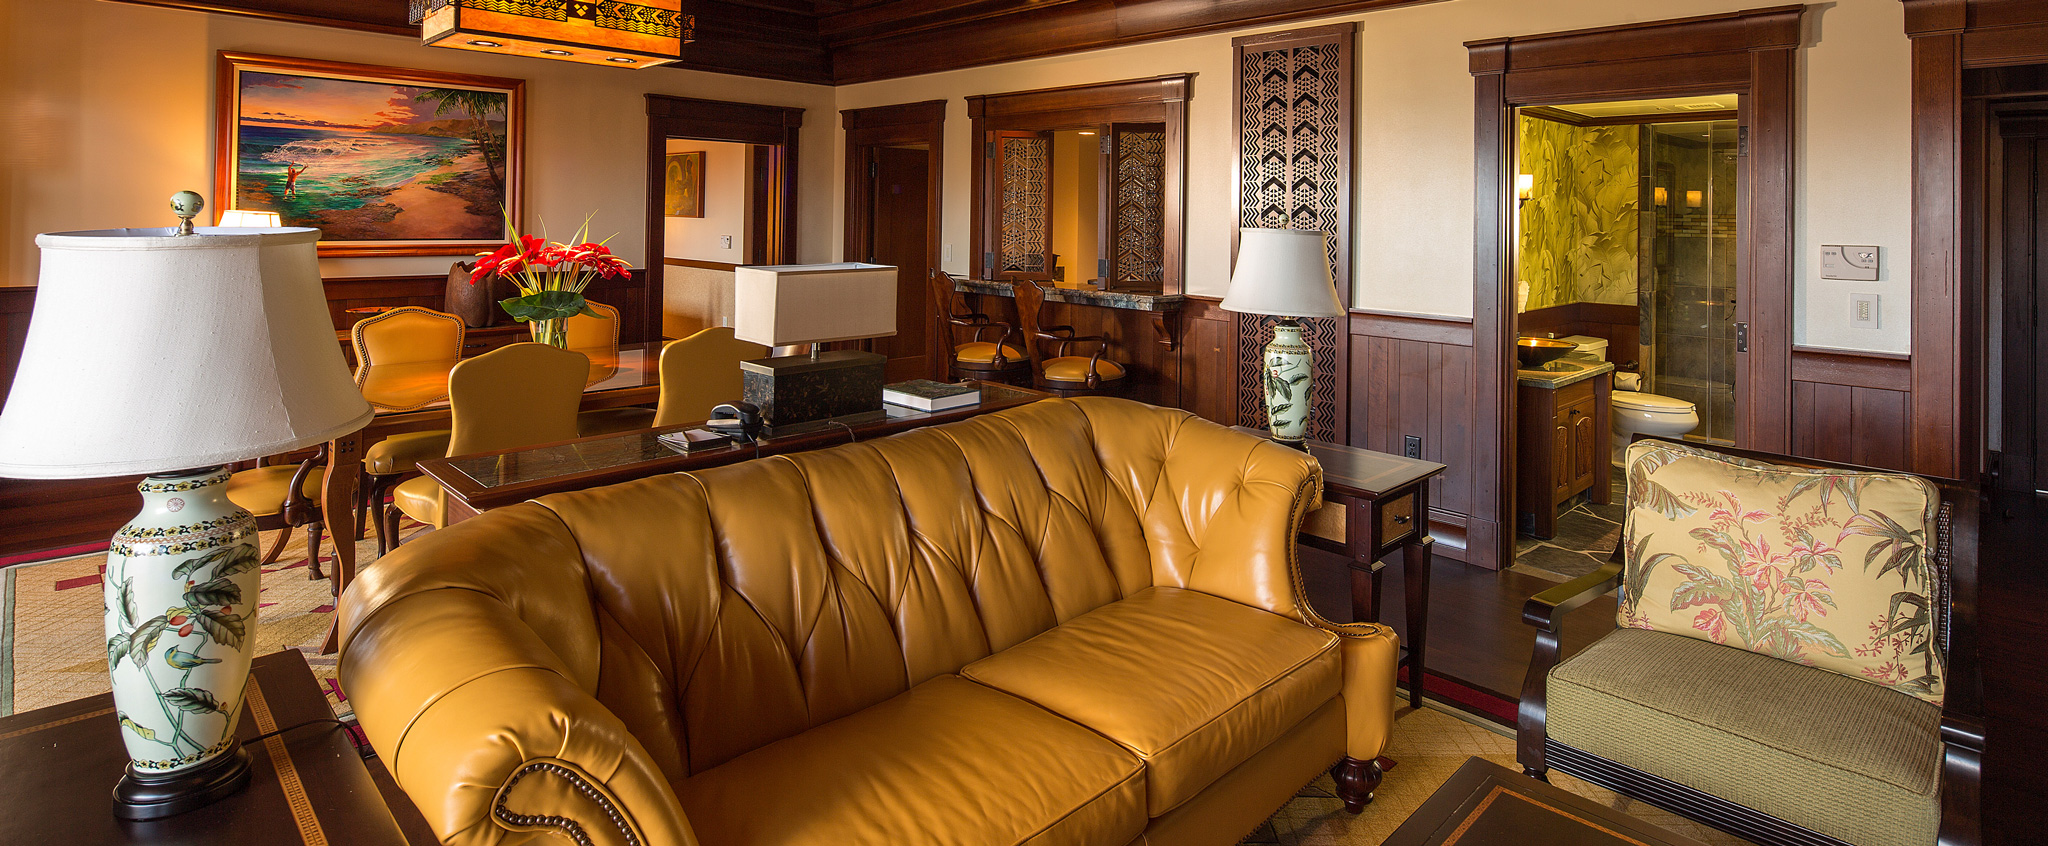 Queen Leather Sleeper Sofa